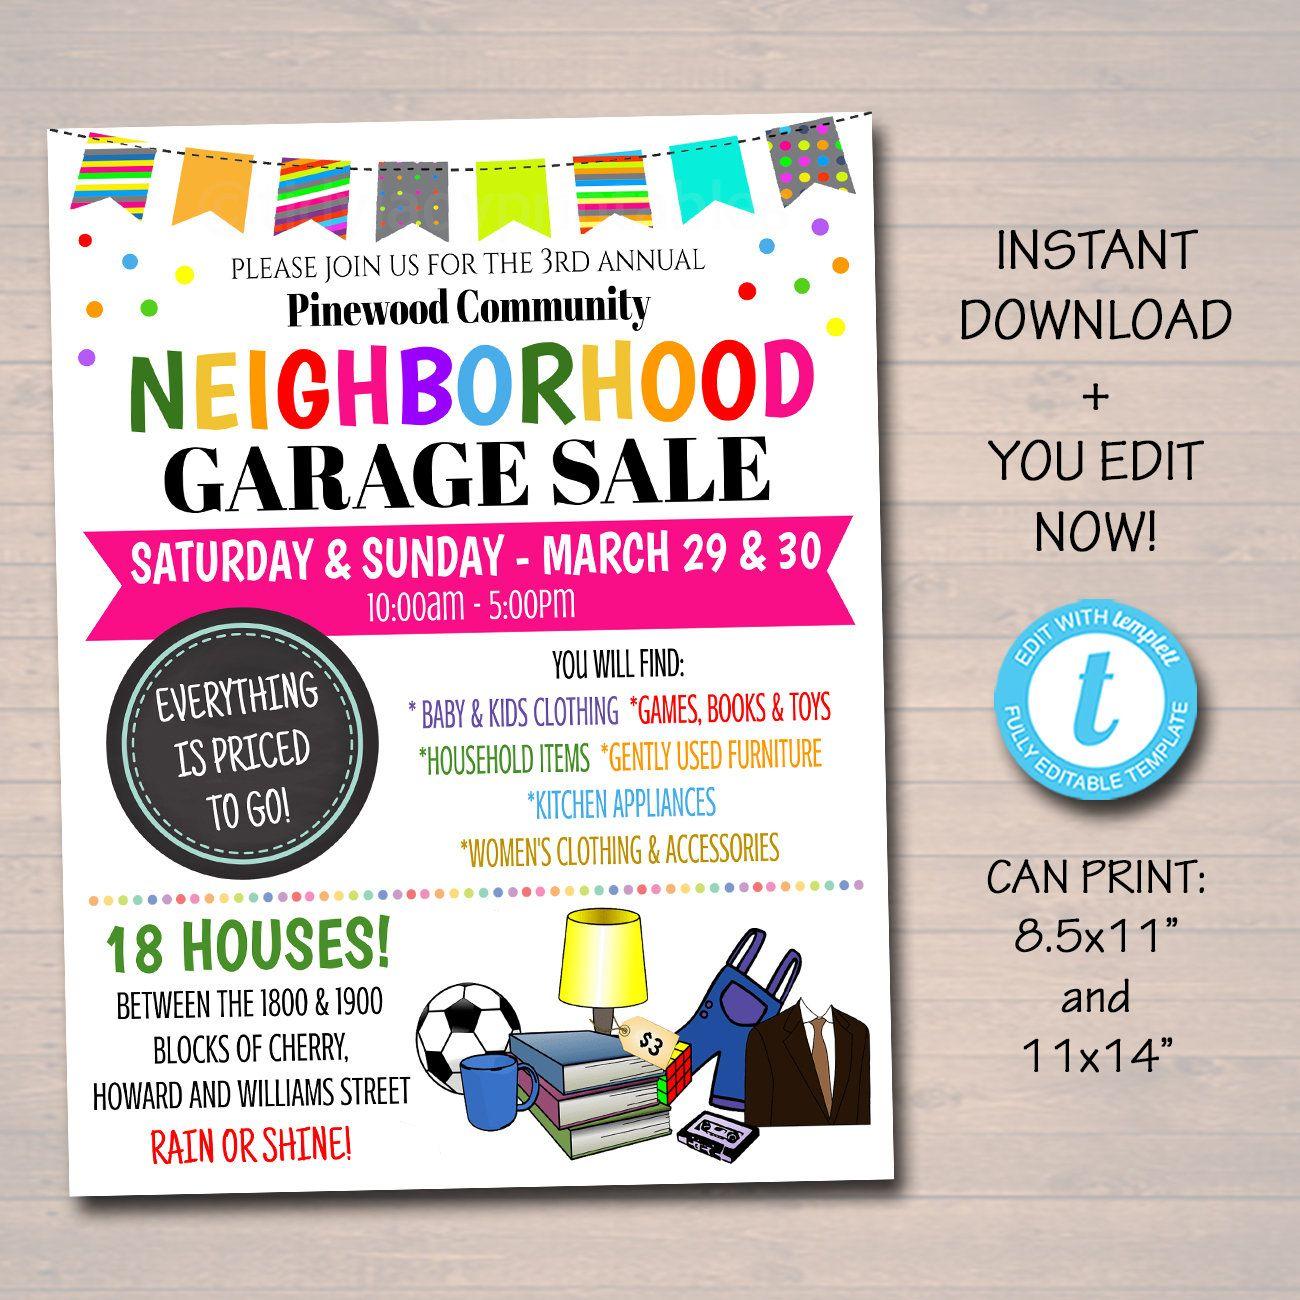 Editable Garage Sale Flyer Printable Pta Pto Flyer School Etsy In 2021 Garage Sales Sale Flyer Pta Organization Church yard sale flyer template